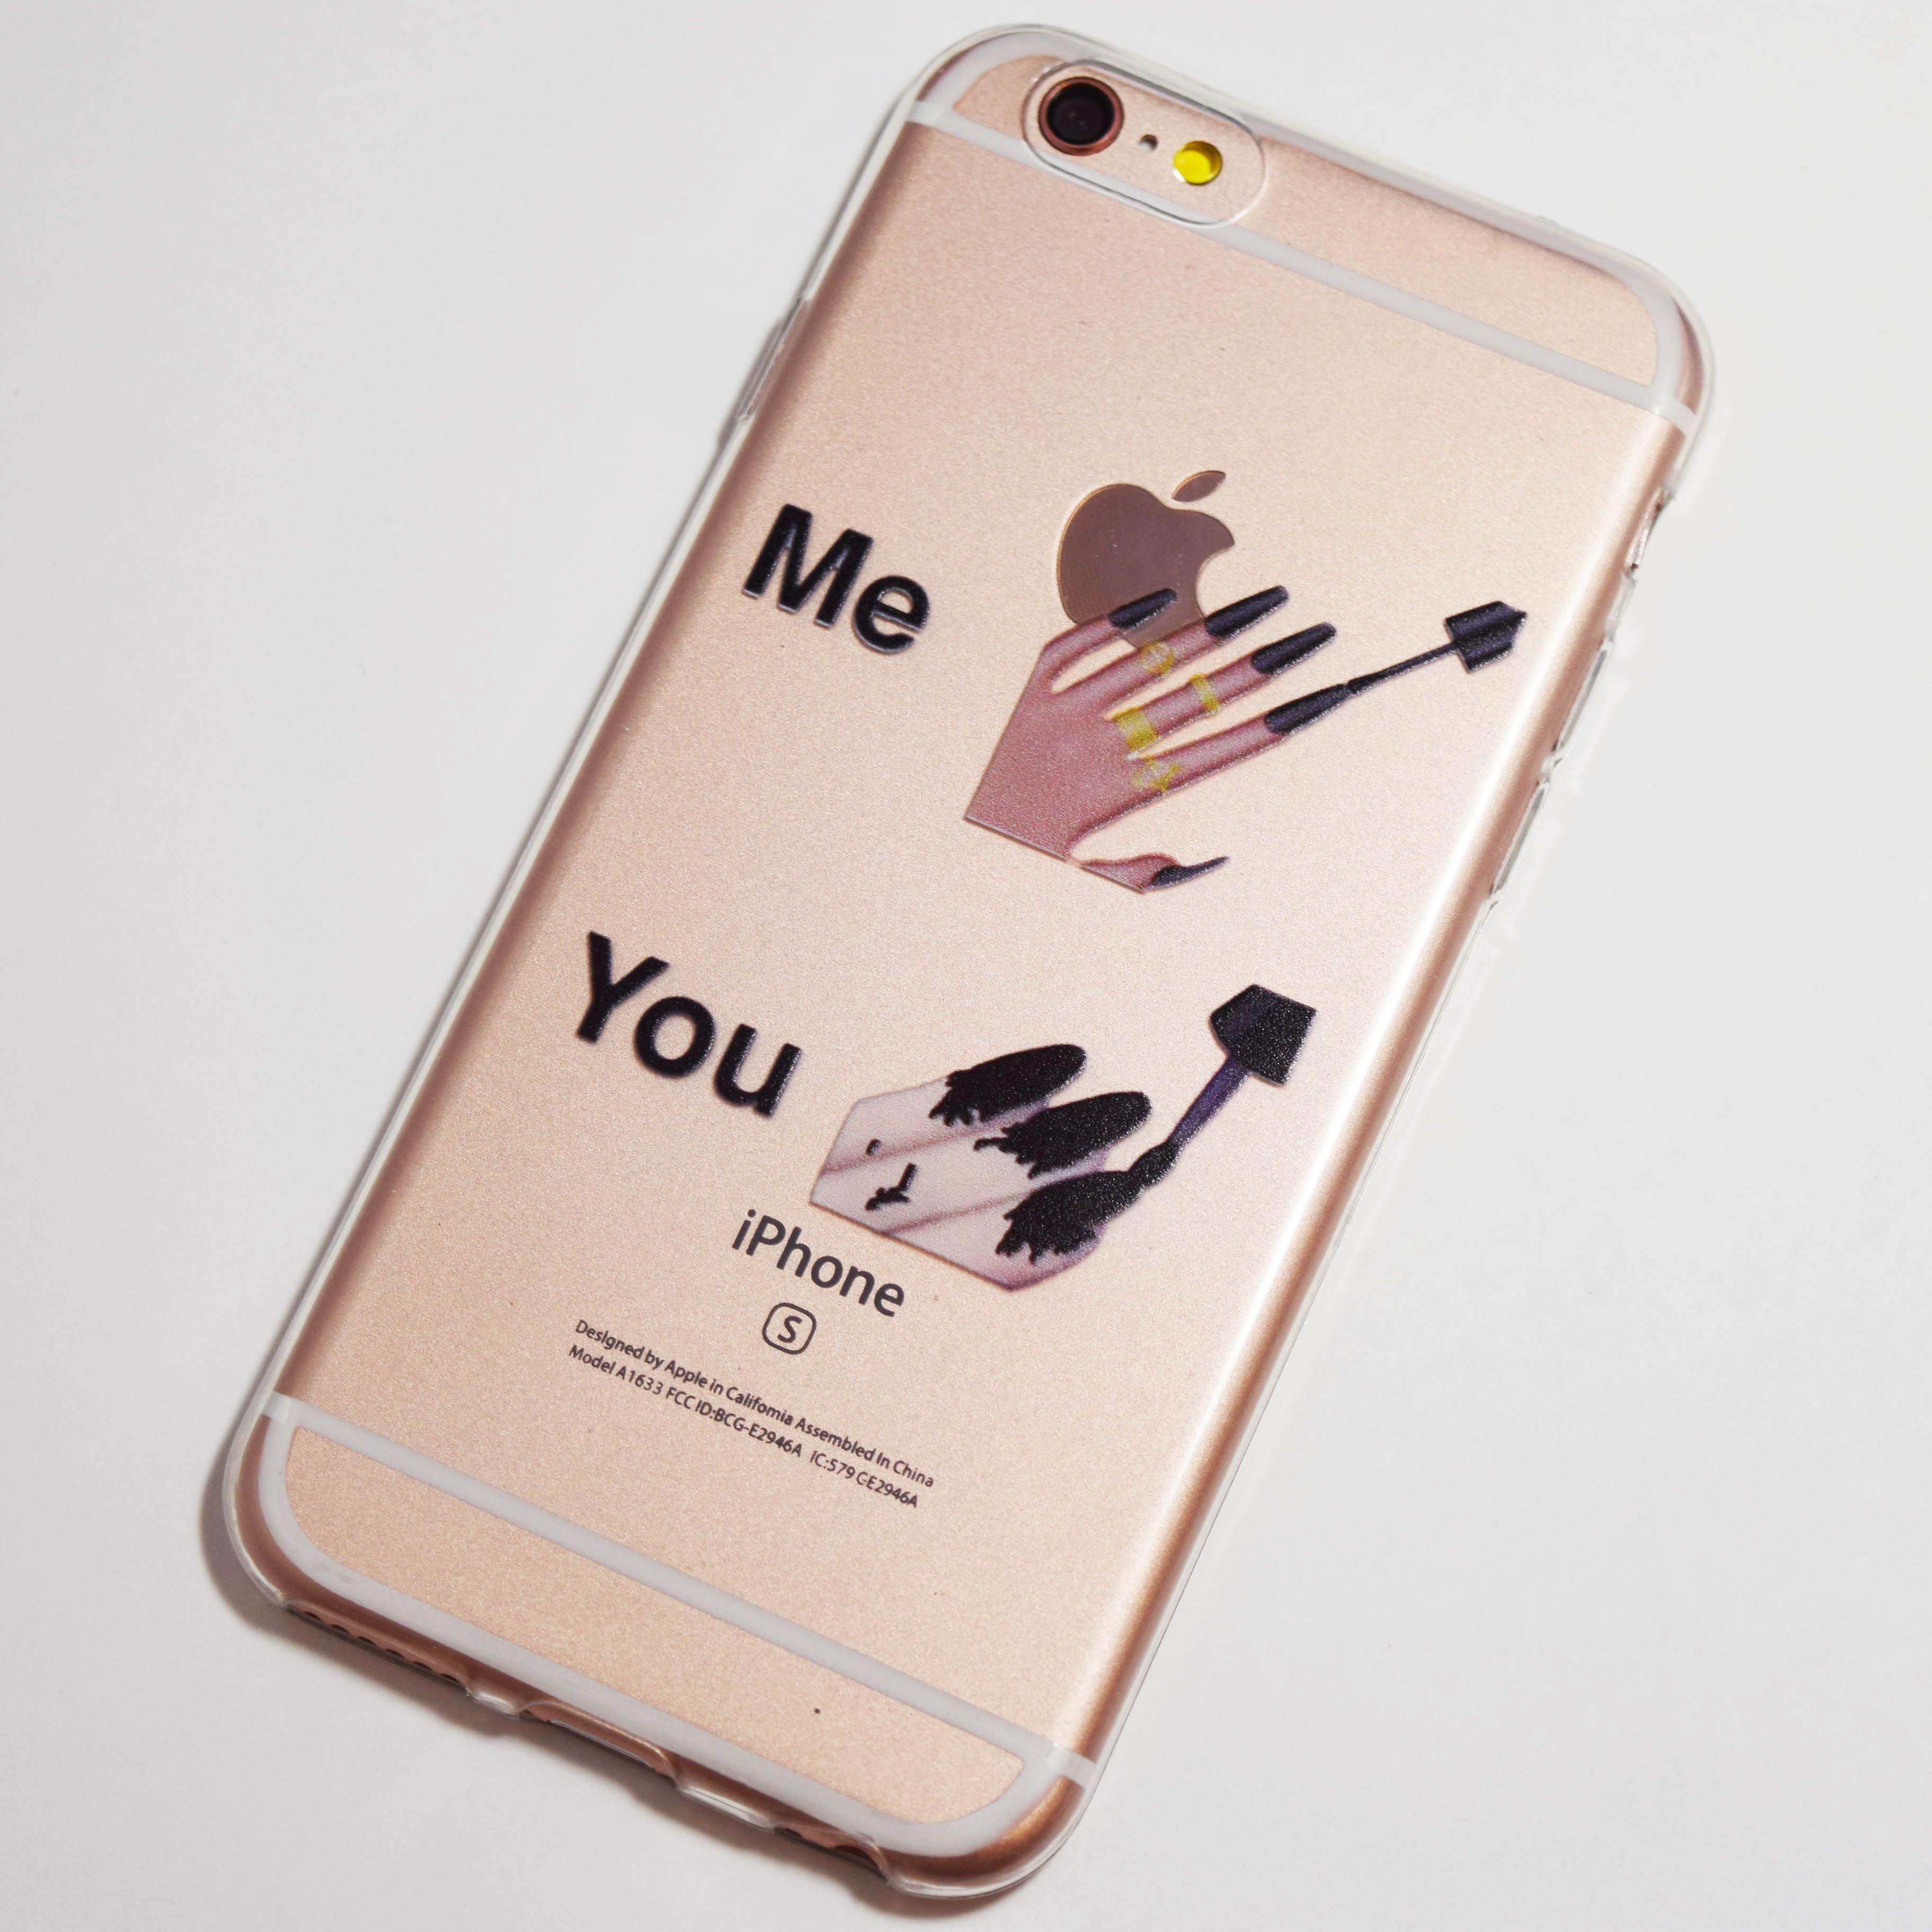 Me vs You Nail Polish Emoji iPhone 6 / 6S Soft Case | General ...